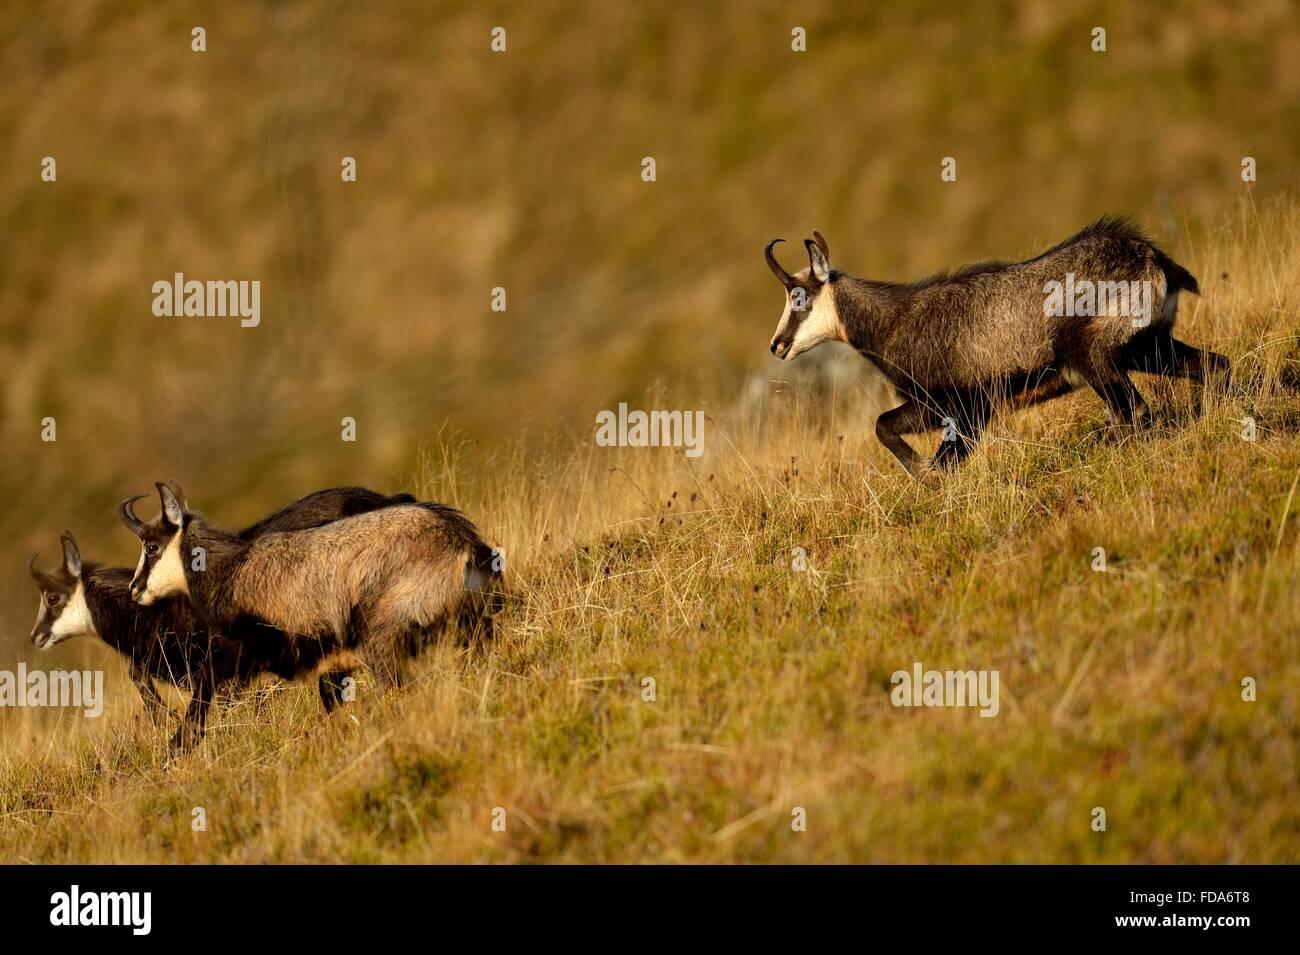 Chamois (Rupicapra rupicapra), rutting buck chasing does, Vosges, Alsace, Lorraine, France - Stock Image